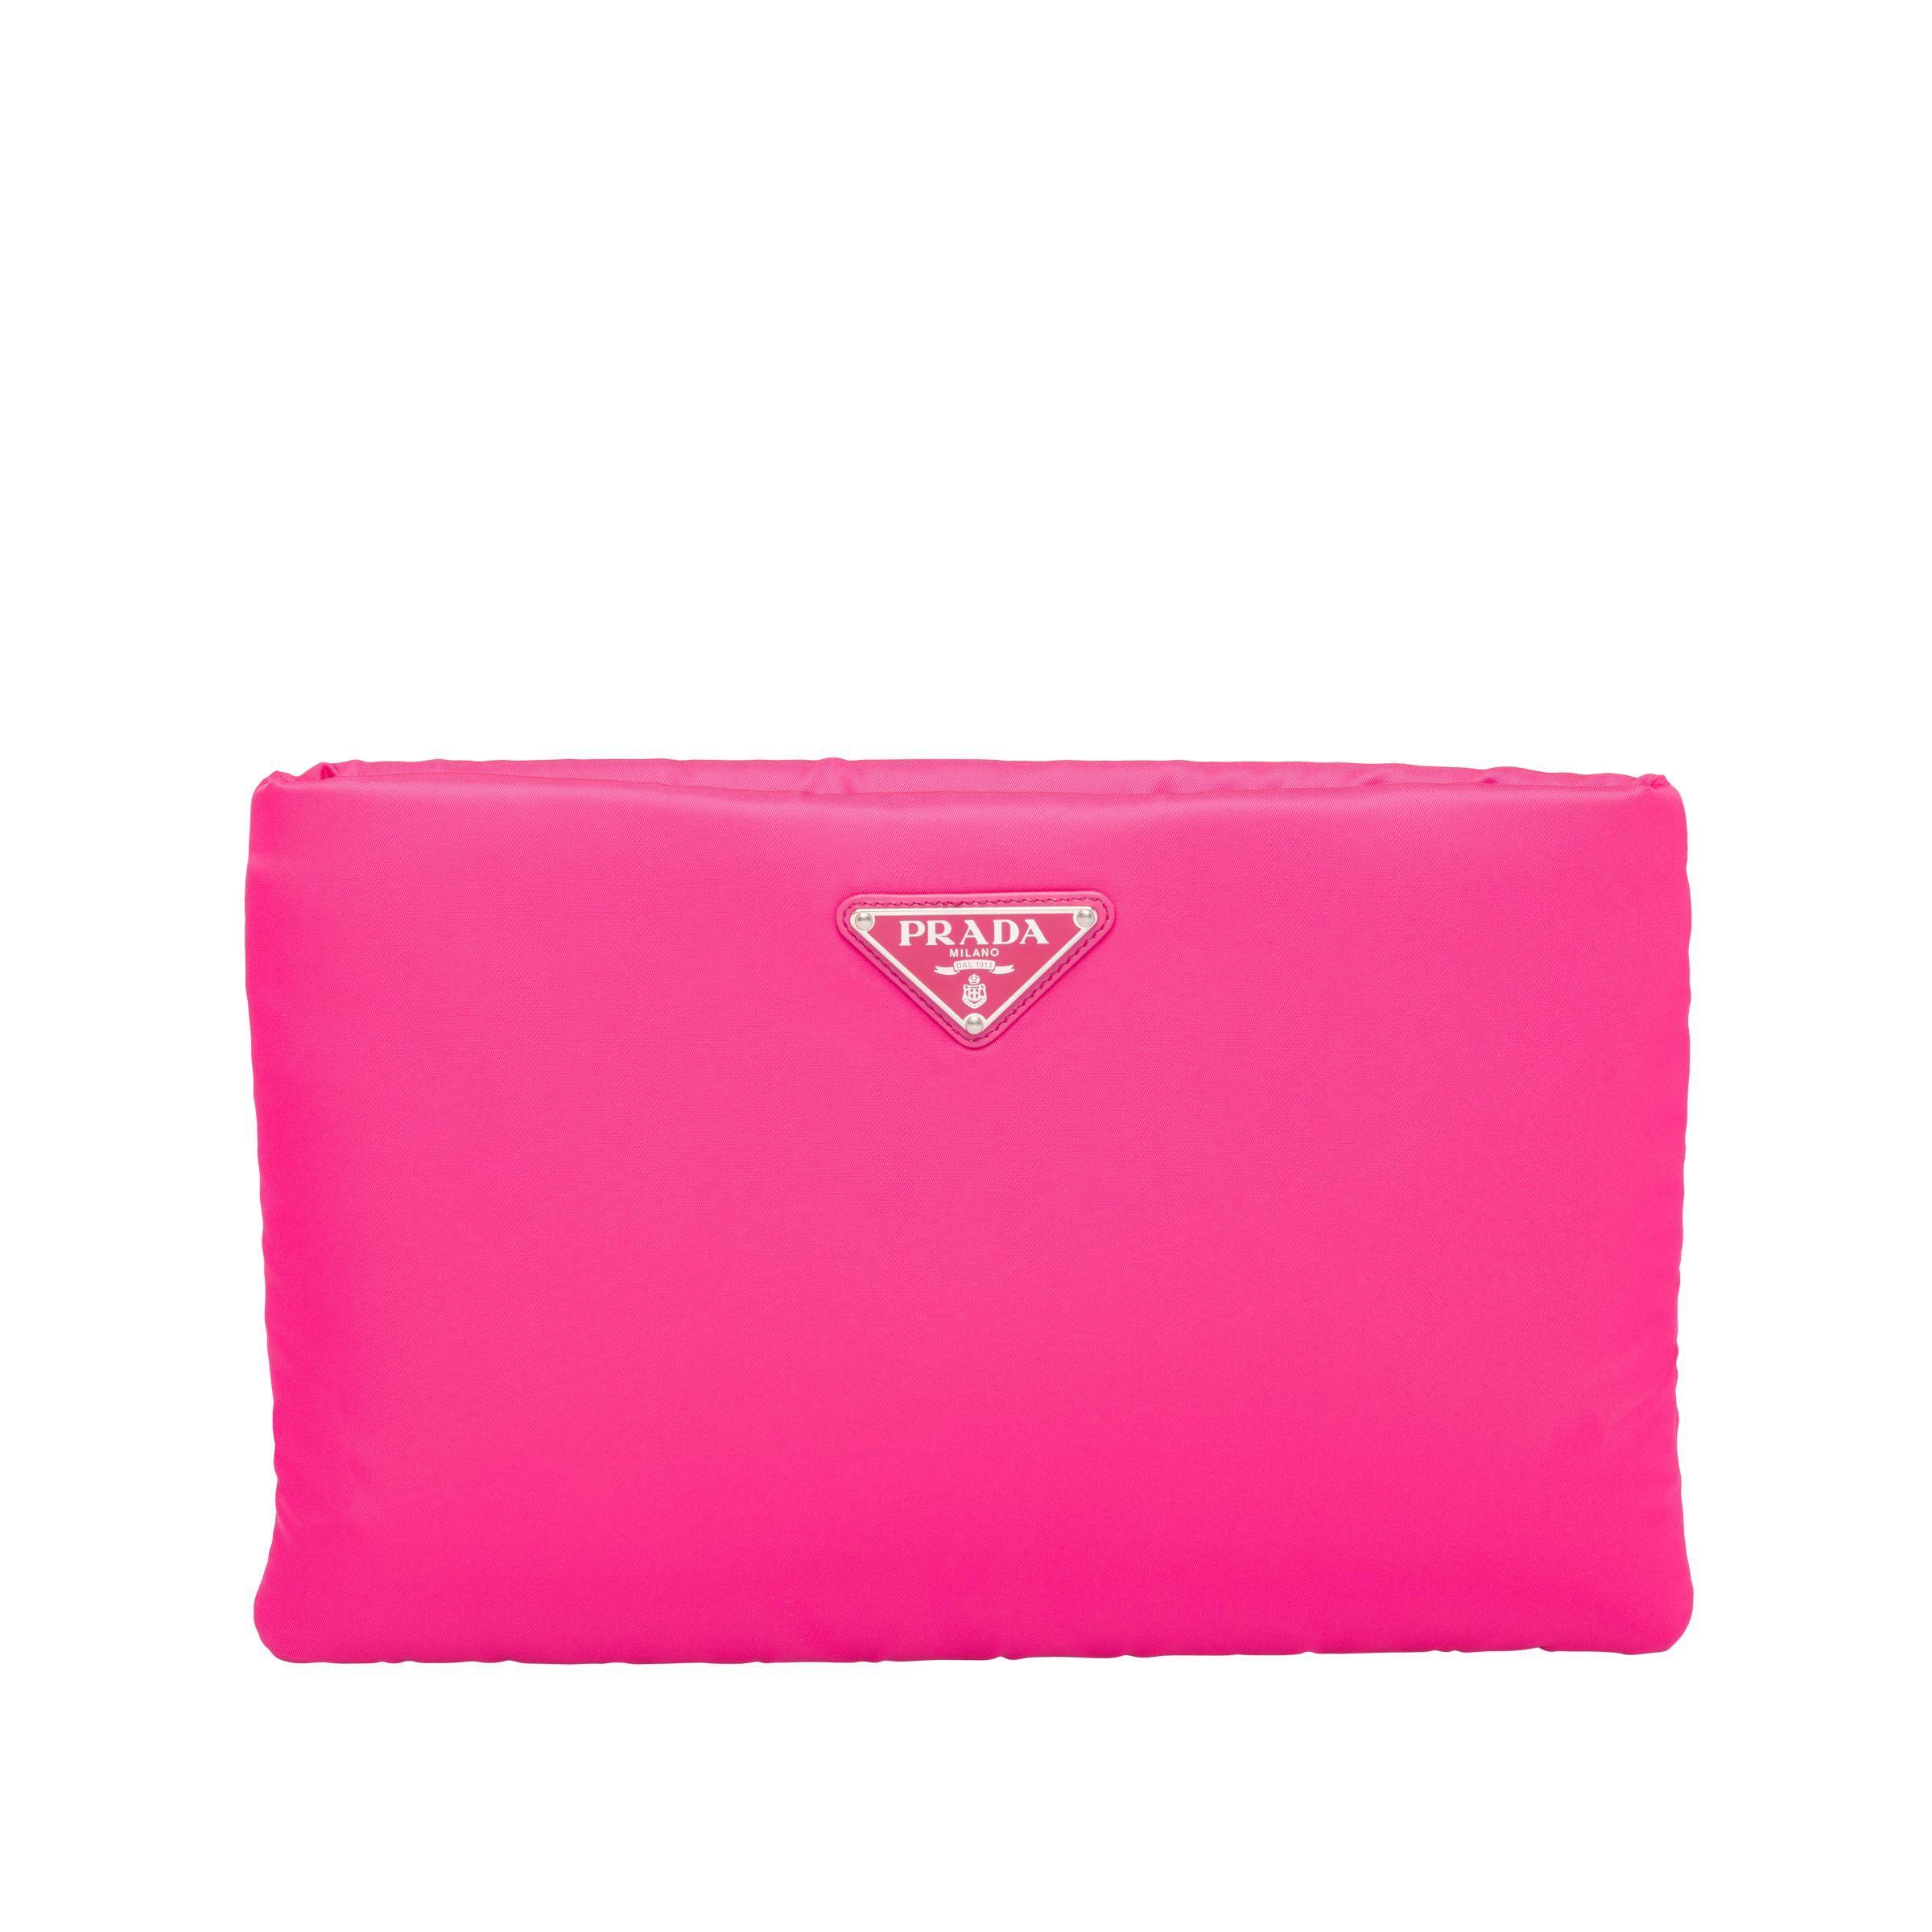 fd43170f4e90 Prada - Pink Medium Padded Nylon Clutch - Lyst. View fullscreen